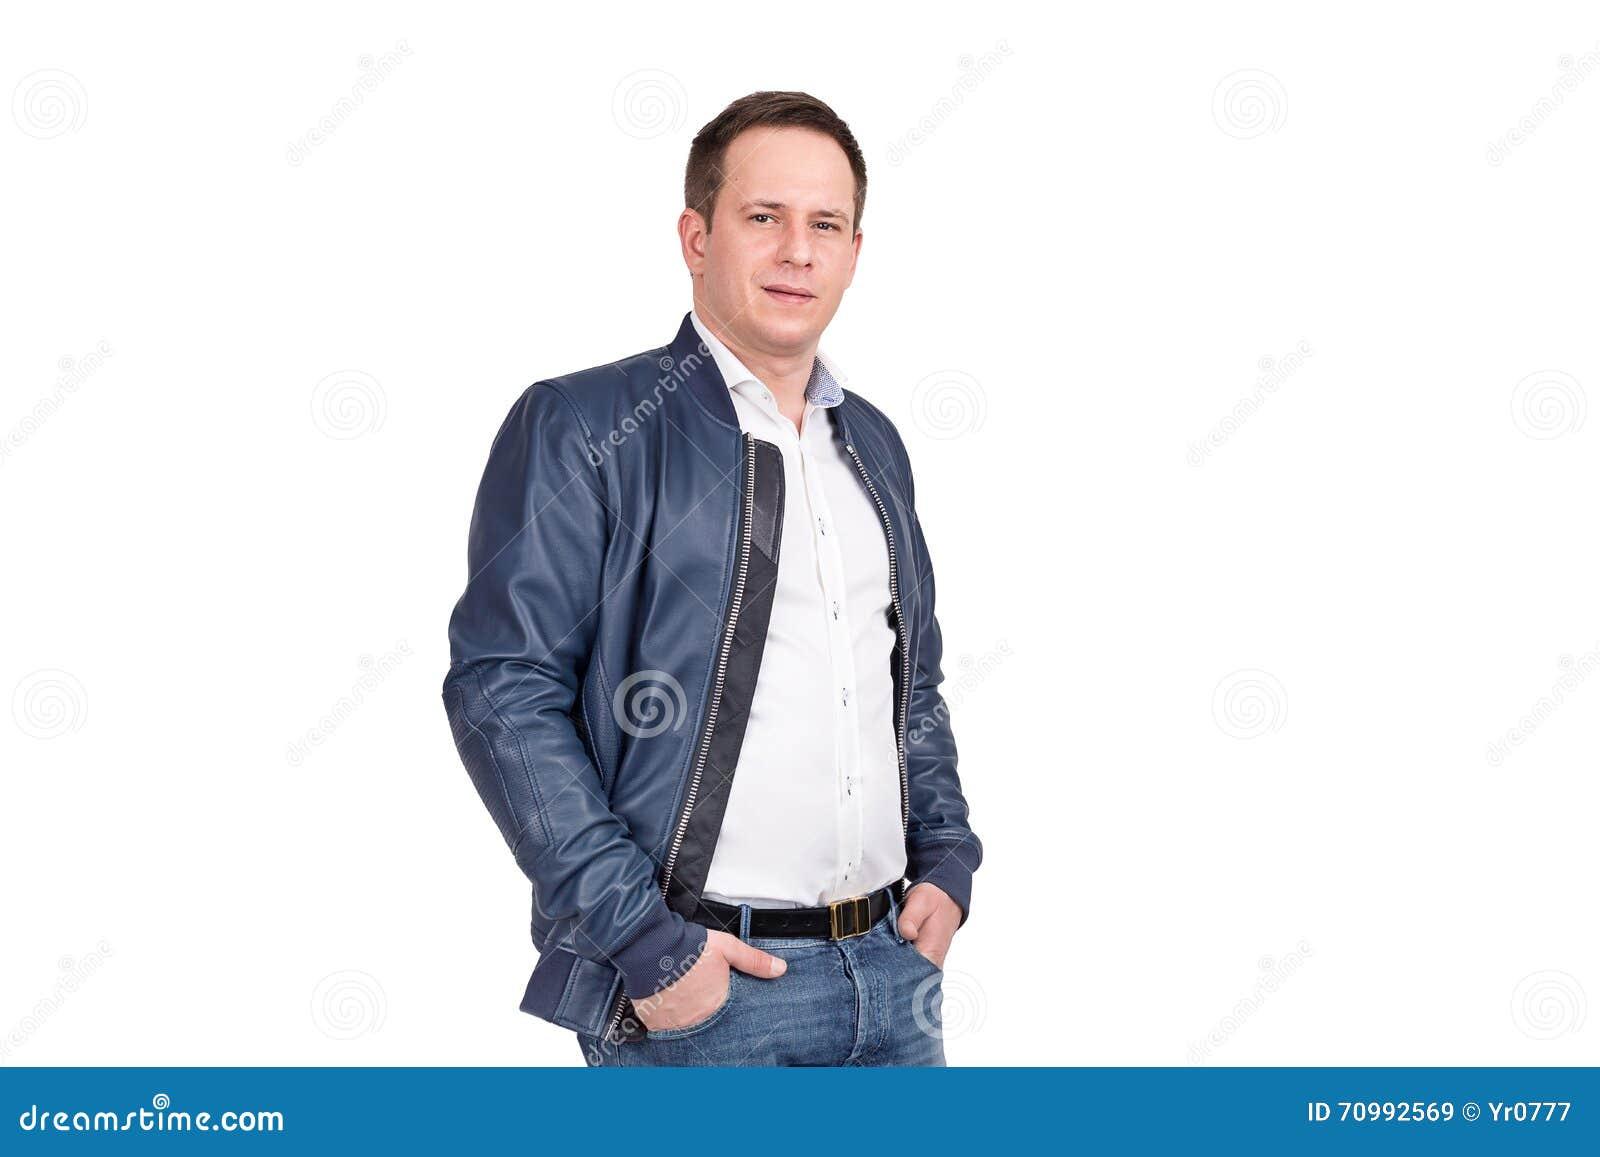 08b46101d758 Όμορφο ευρωπαϊκό άτομο στο άσπρο πουκάμισο